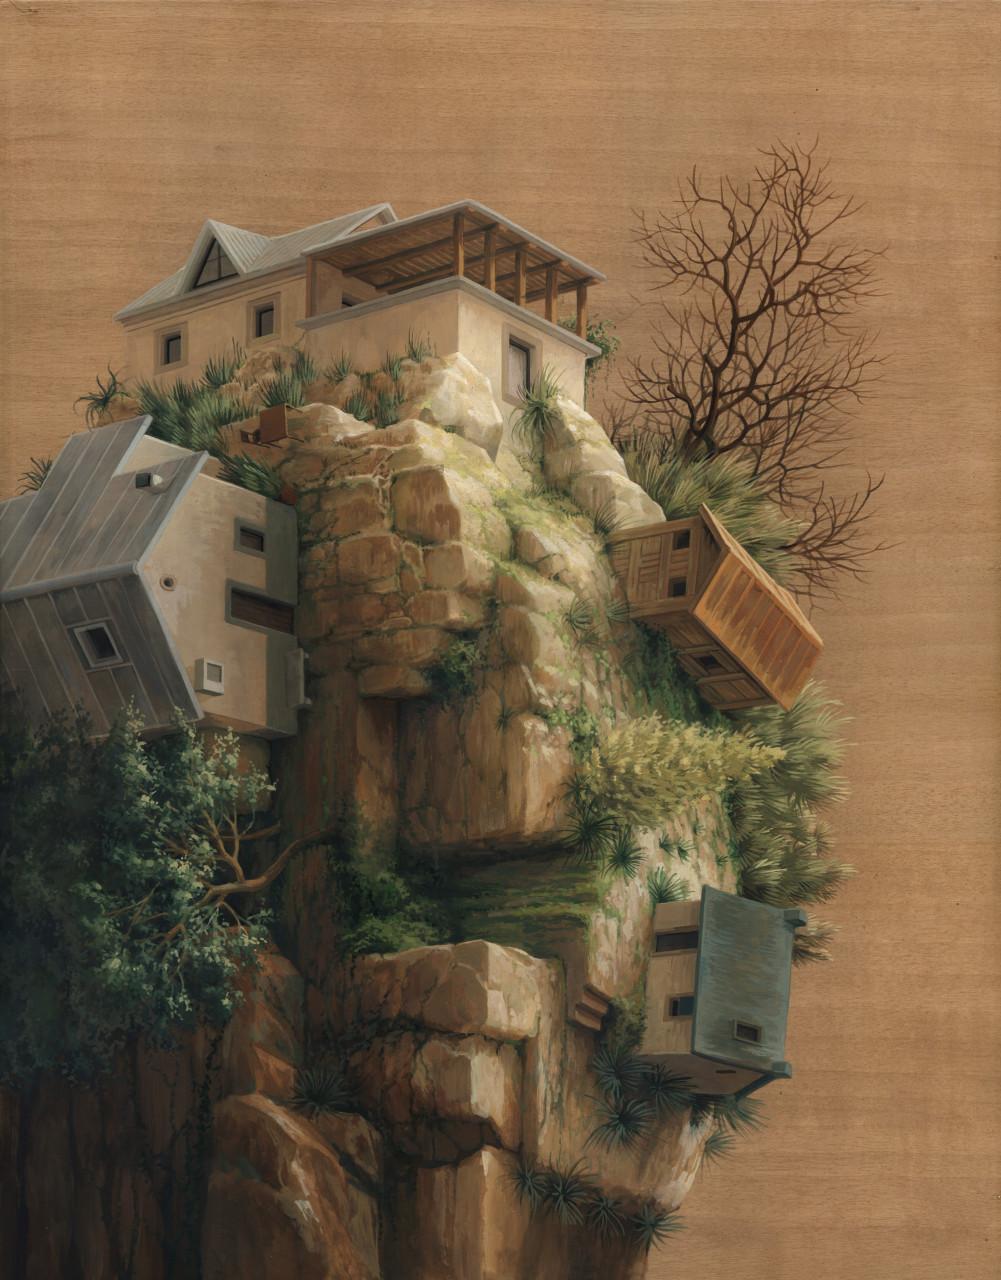 Living-on-the-rocks-40x50cm-web-1001x1280.jpg